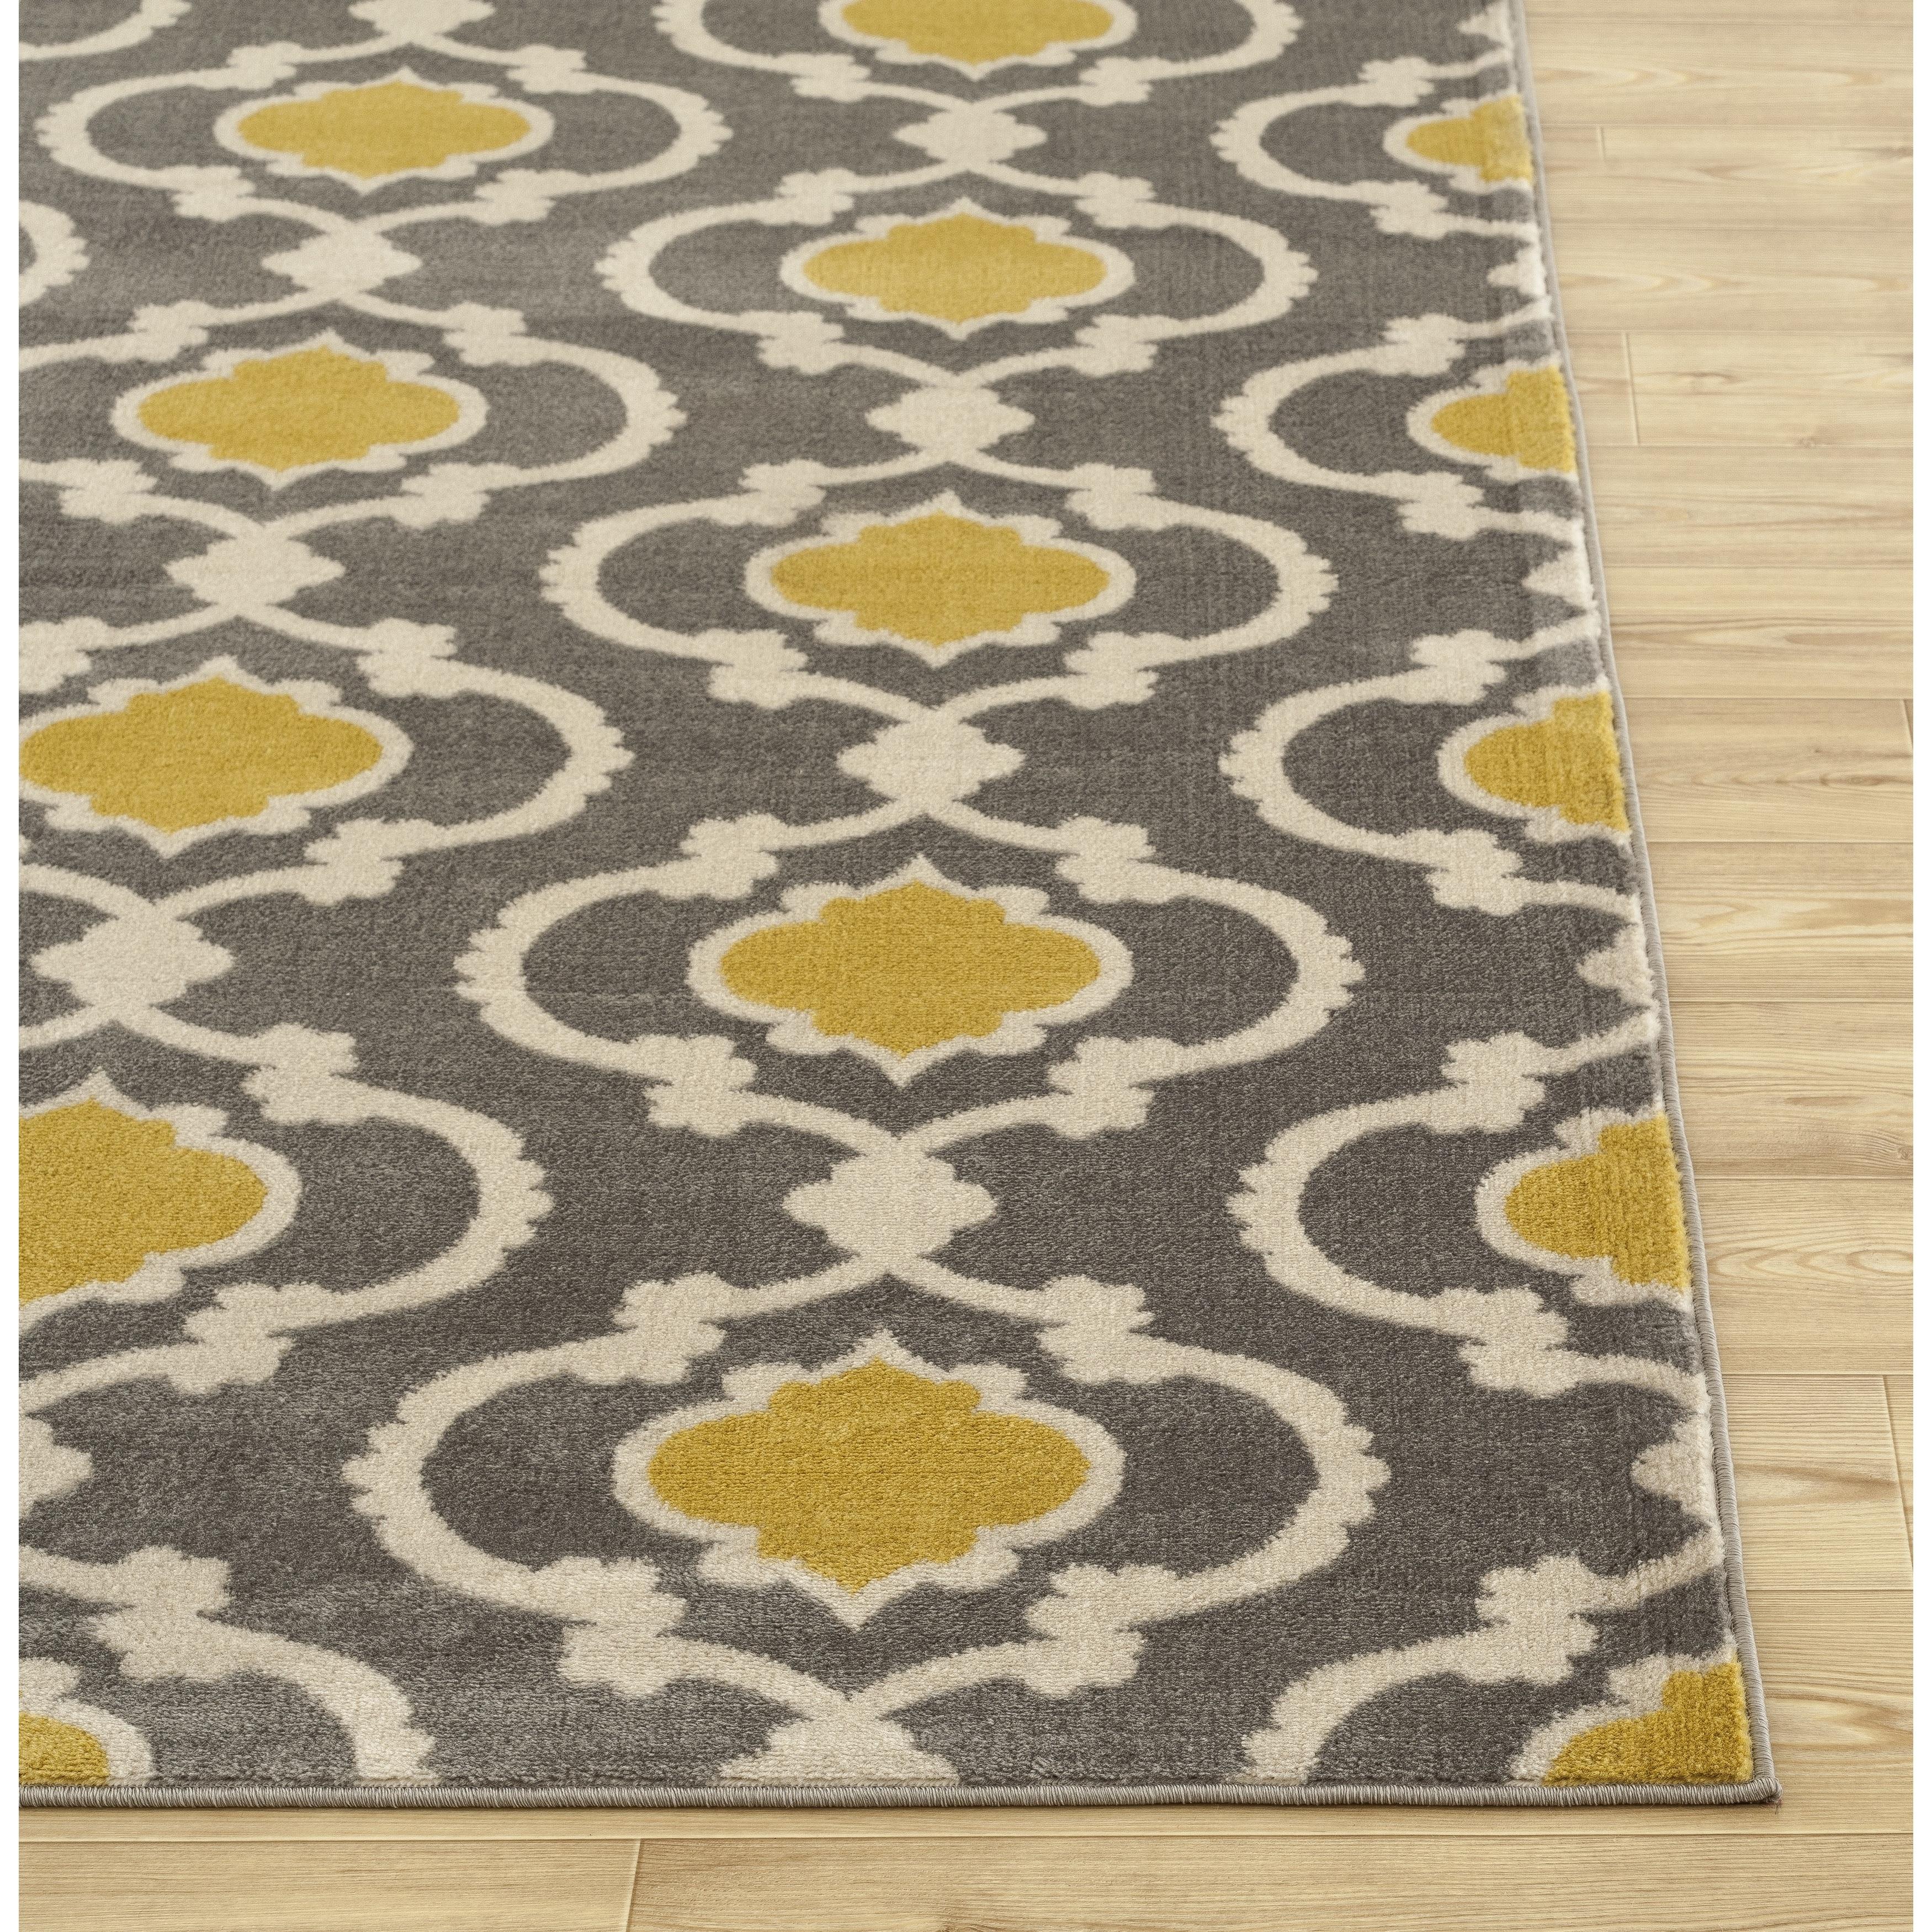 porch  den marigny touro trellis grey yellow area rug (' x ') free shipping today  overstockcom  . porch  den marigny touro trellis grey yellow area rug (' x